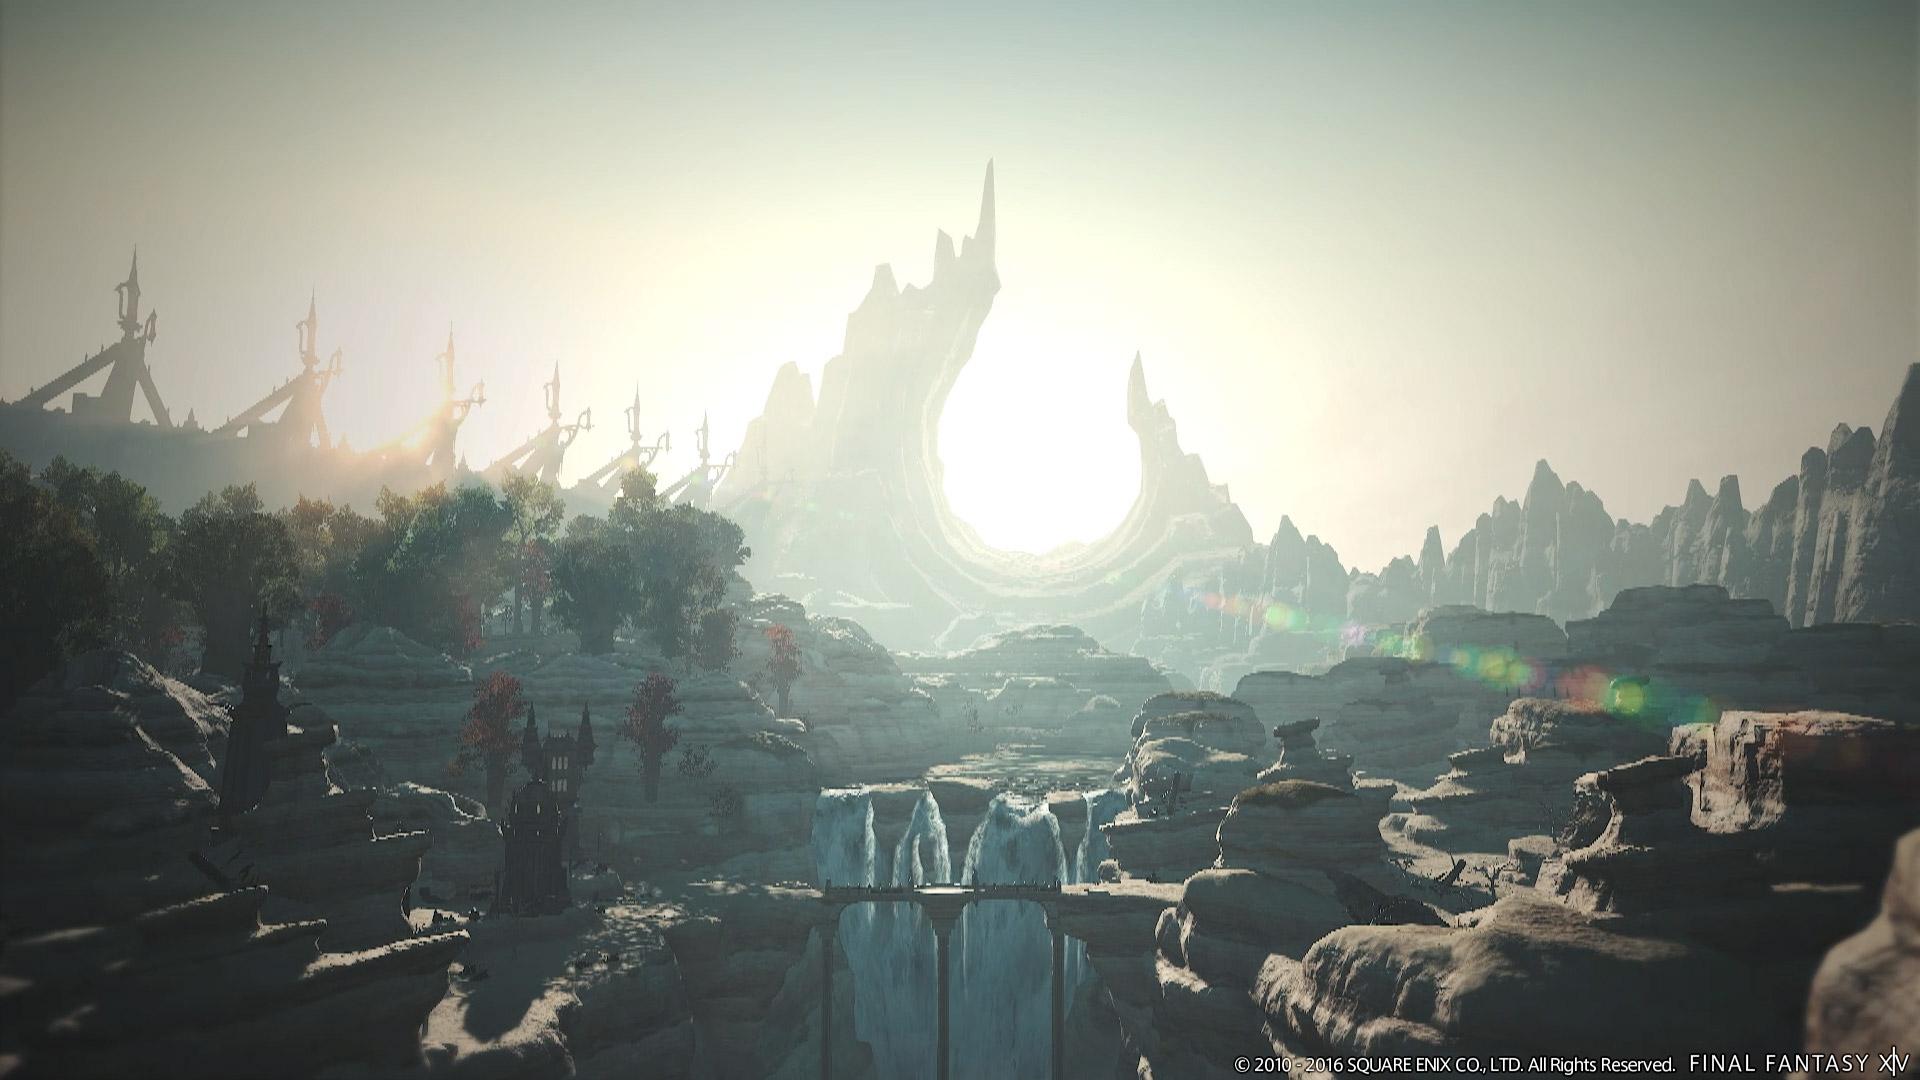 Final Fantasy Xiv Stormblood Pc Game Download Breaker Load Http Www Shopping Com Square Enix D Co Screenshots